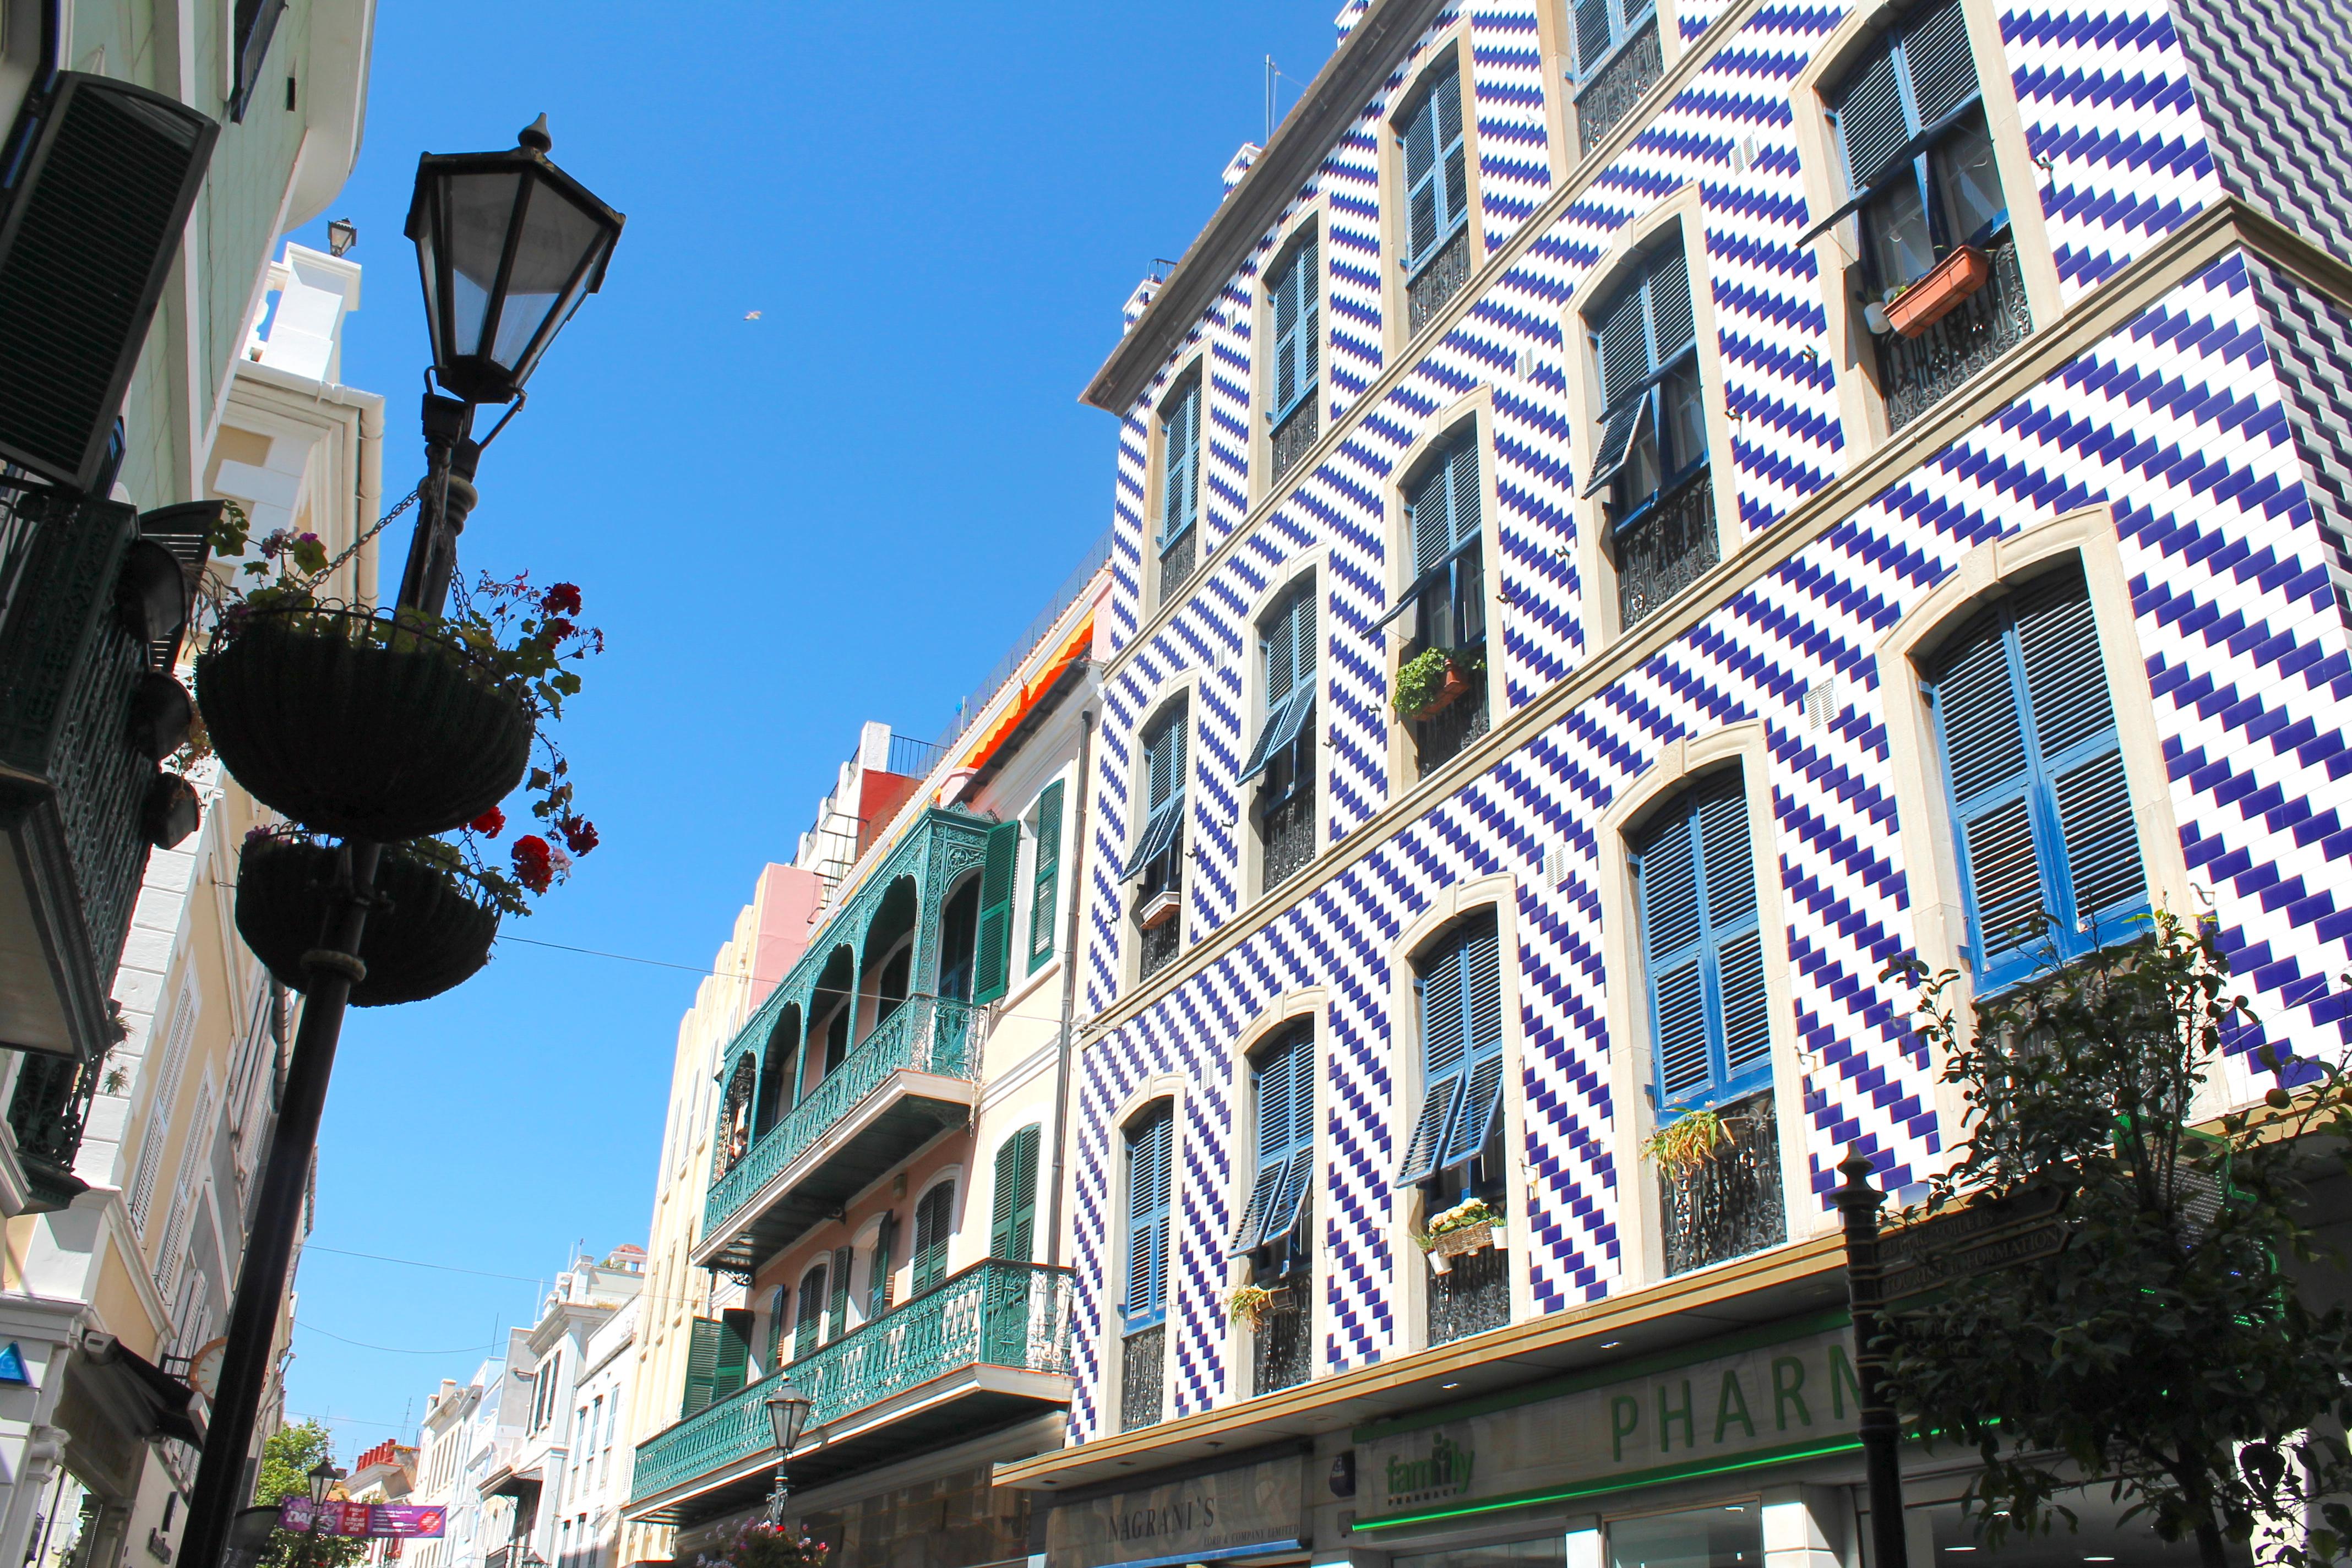 gibraltar-city-center-lustforthesublime